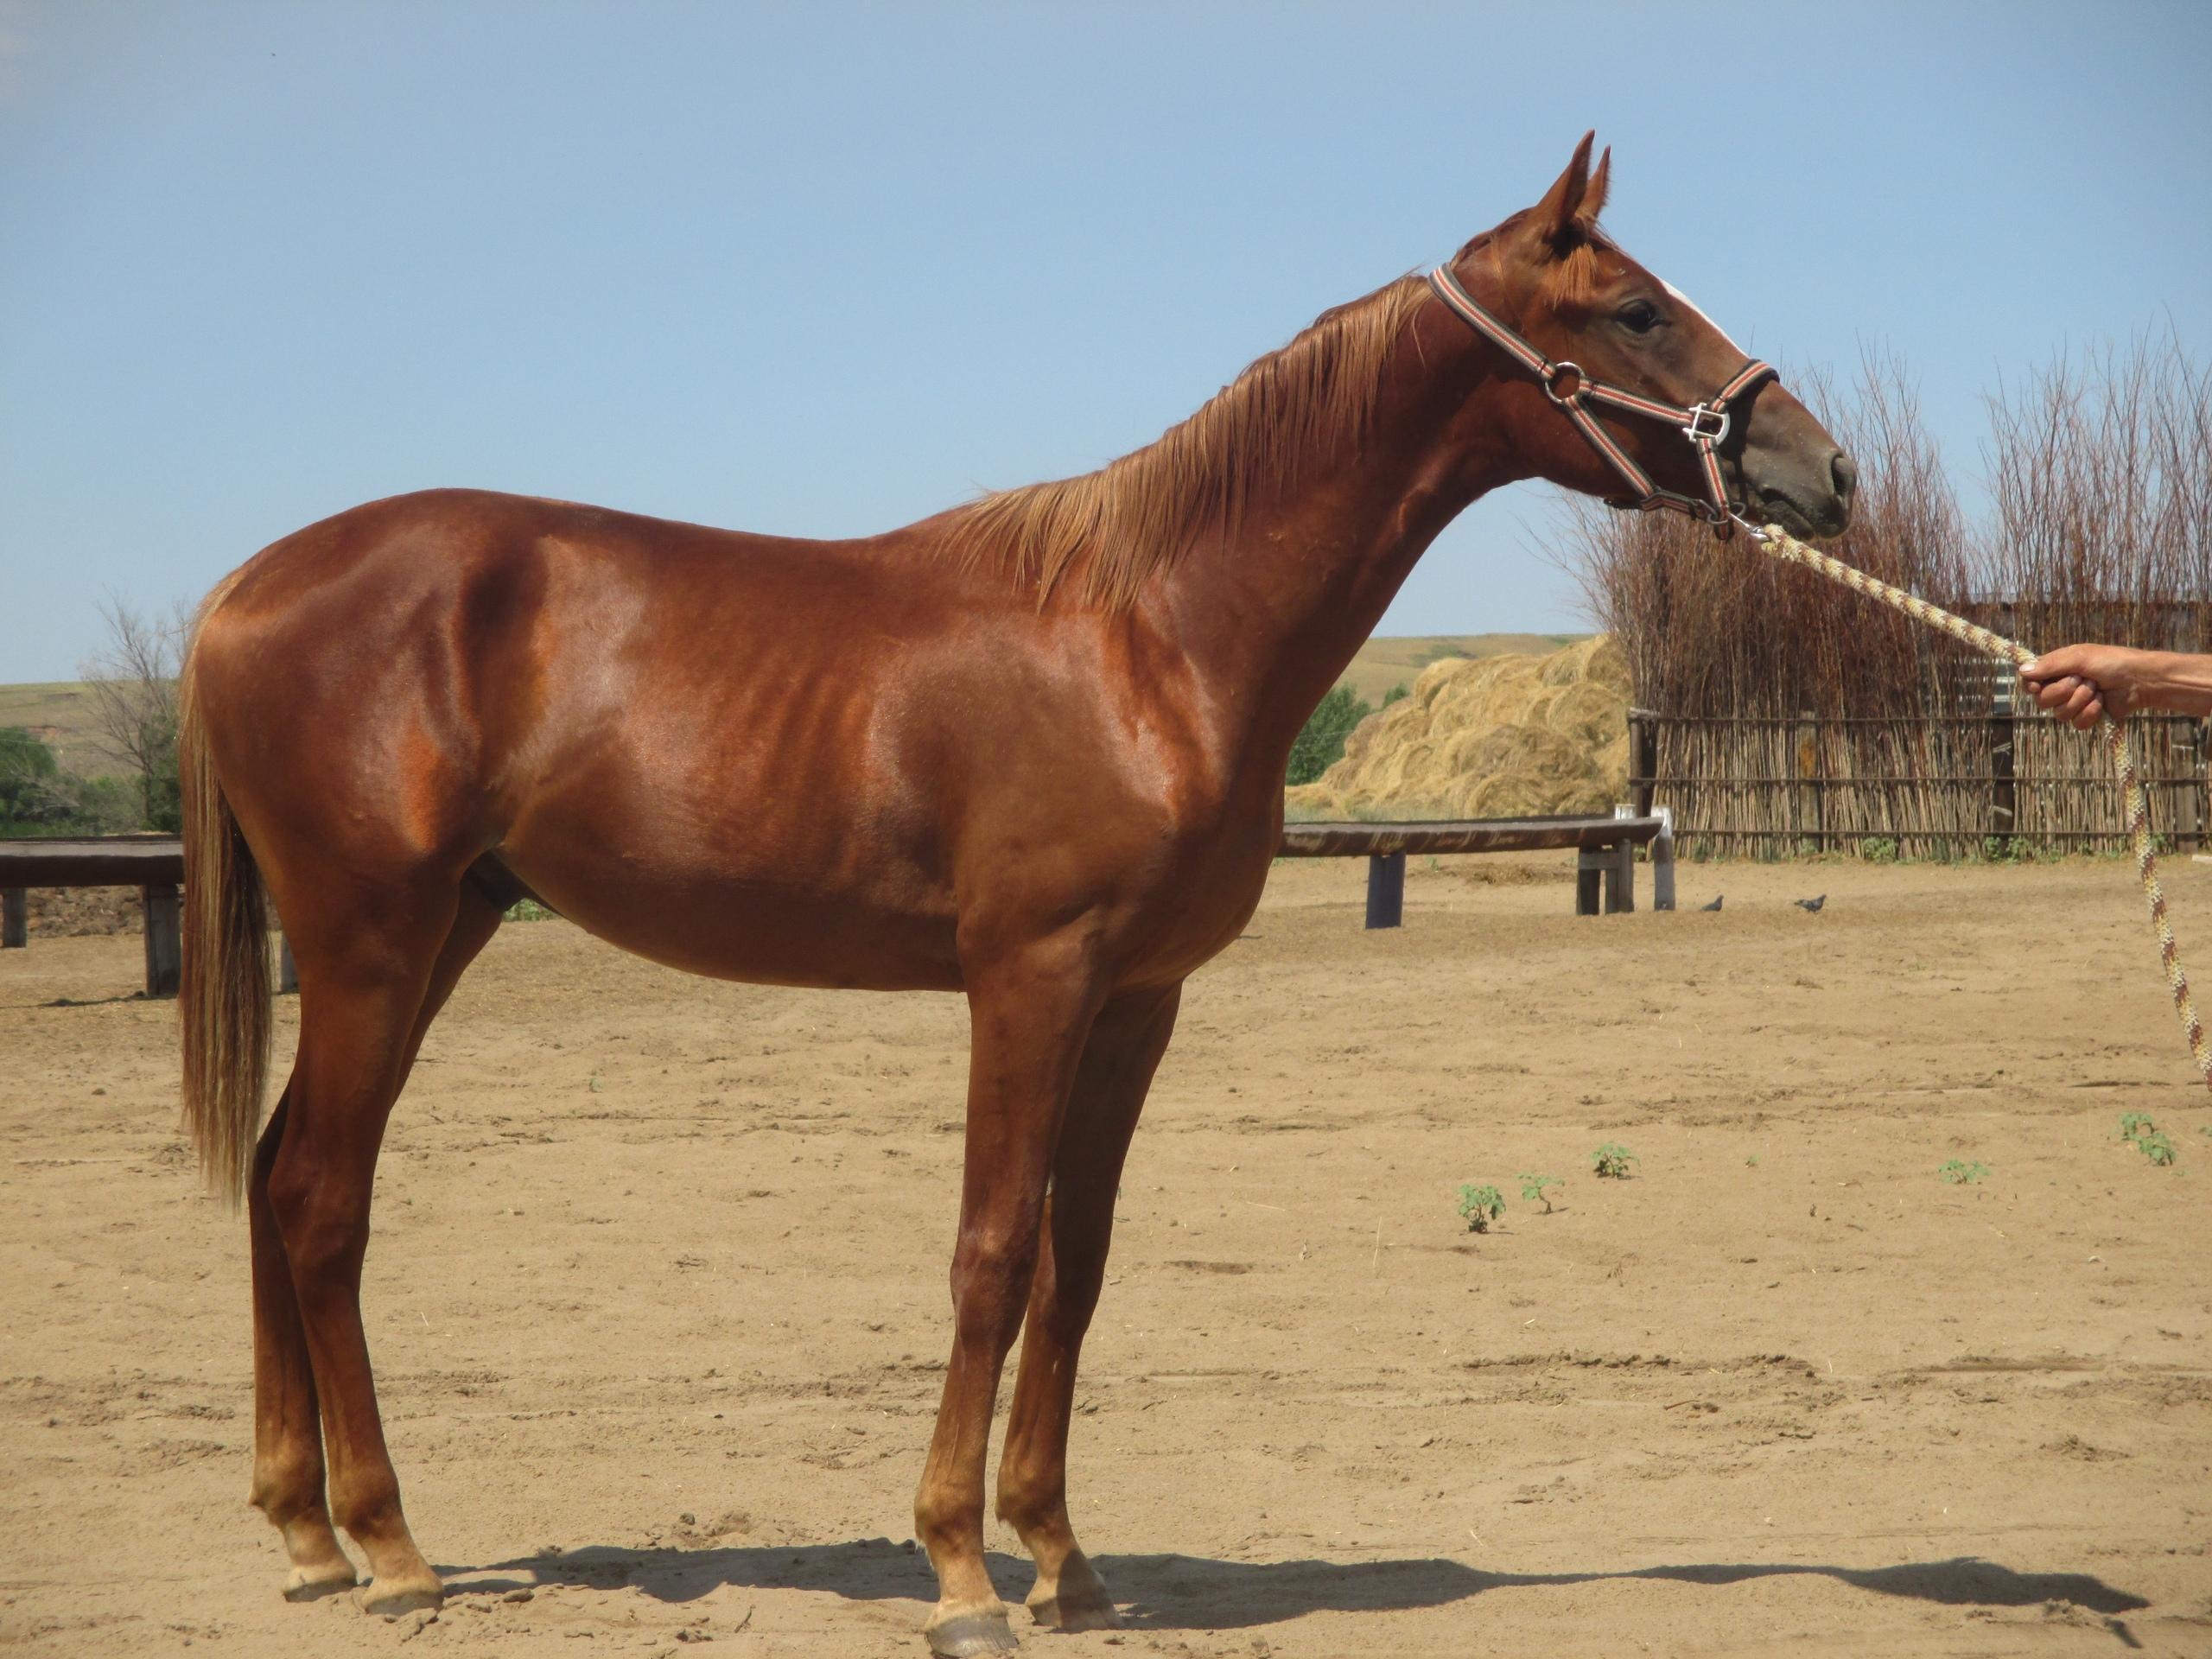 Донская порода лошадей: история, описание, фото и видео, характеристика, характер